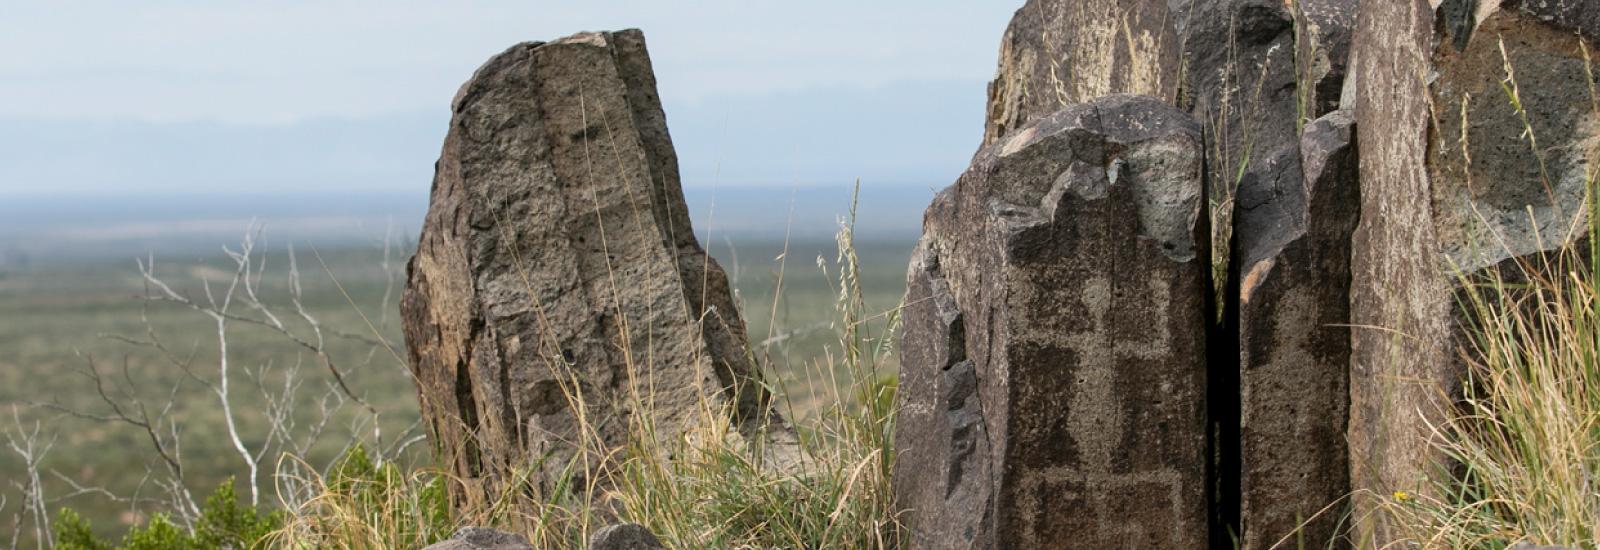 White Sands Missile Range Outdoor Recreation